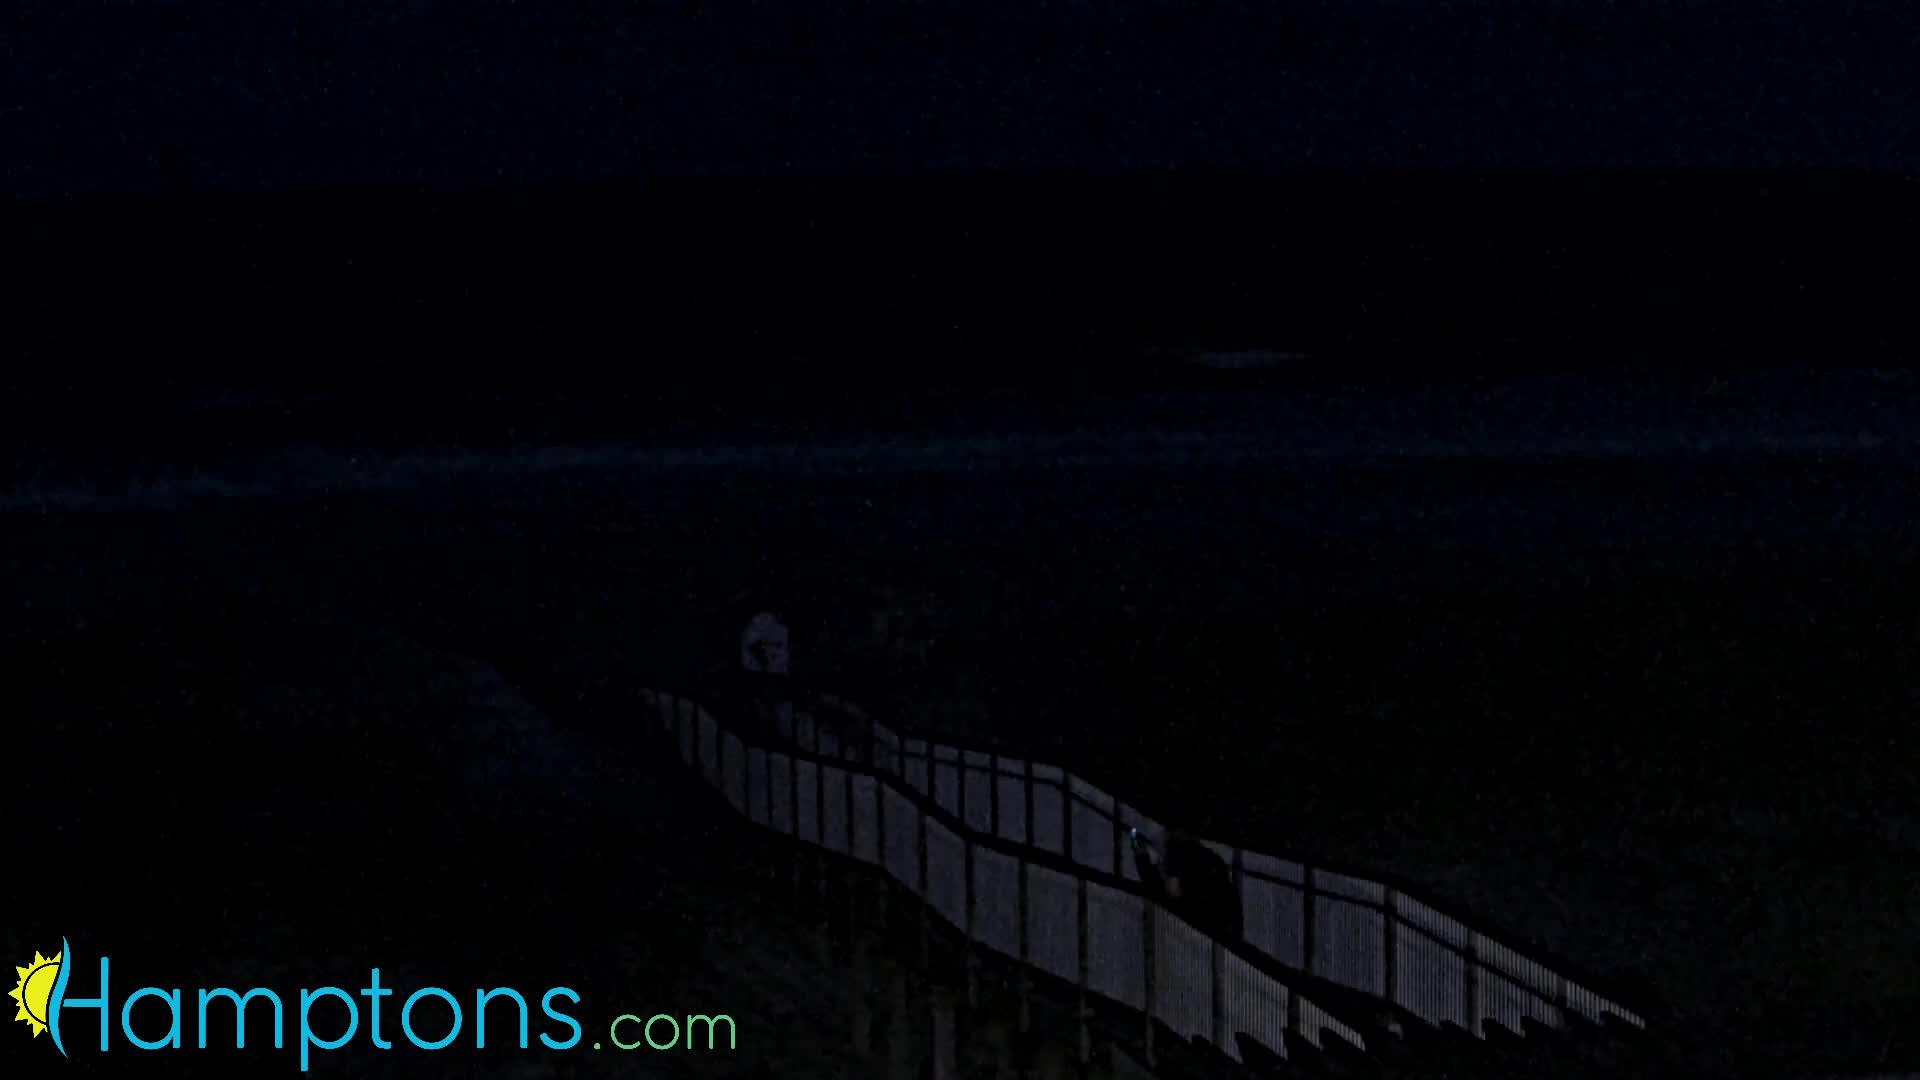 Ponquogue Beach Pavilion, Hampton Bays, New York Henri (2021)